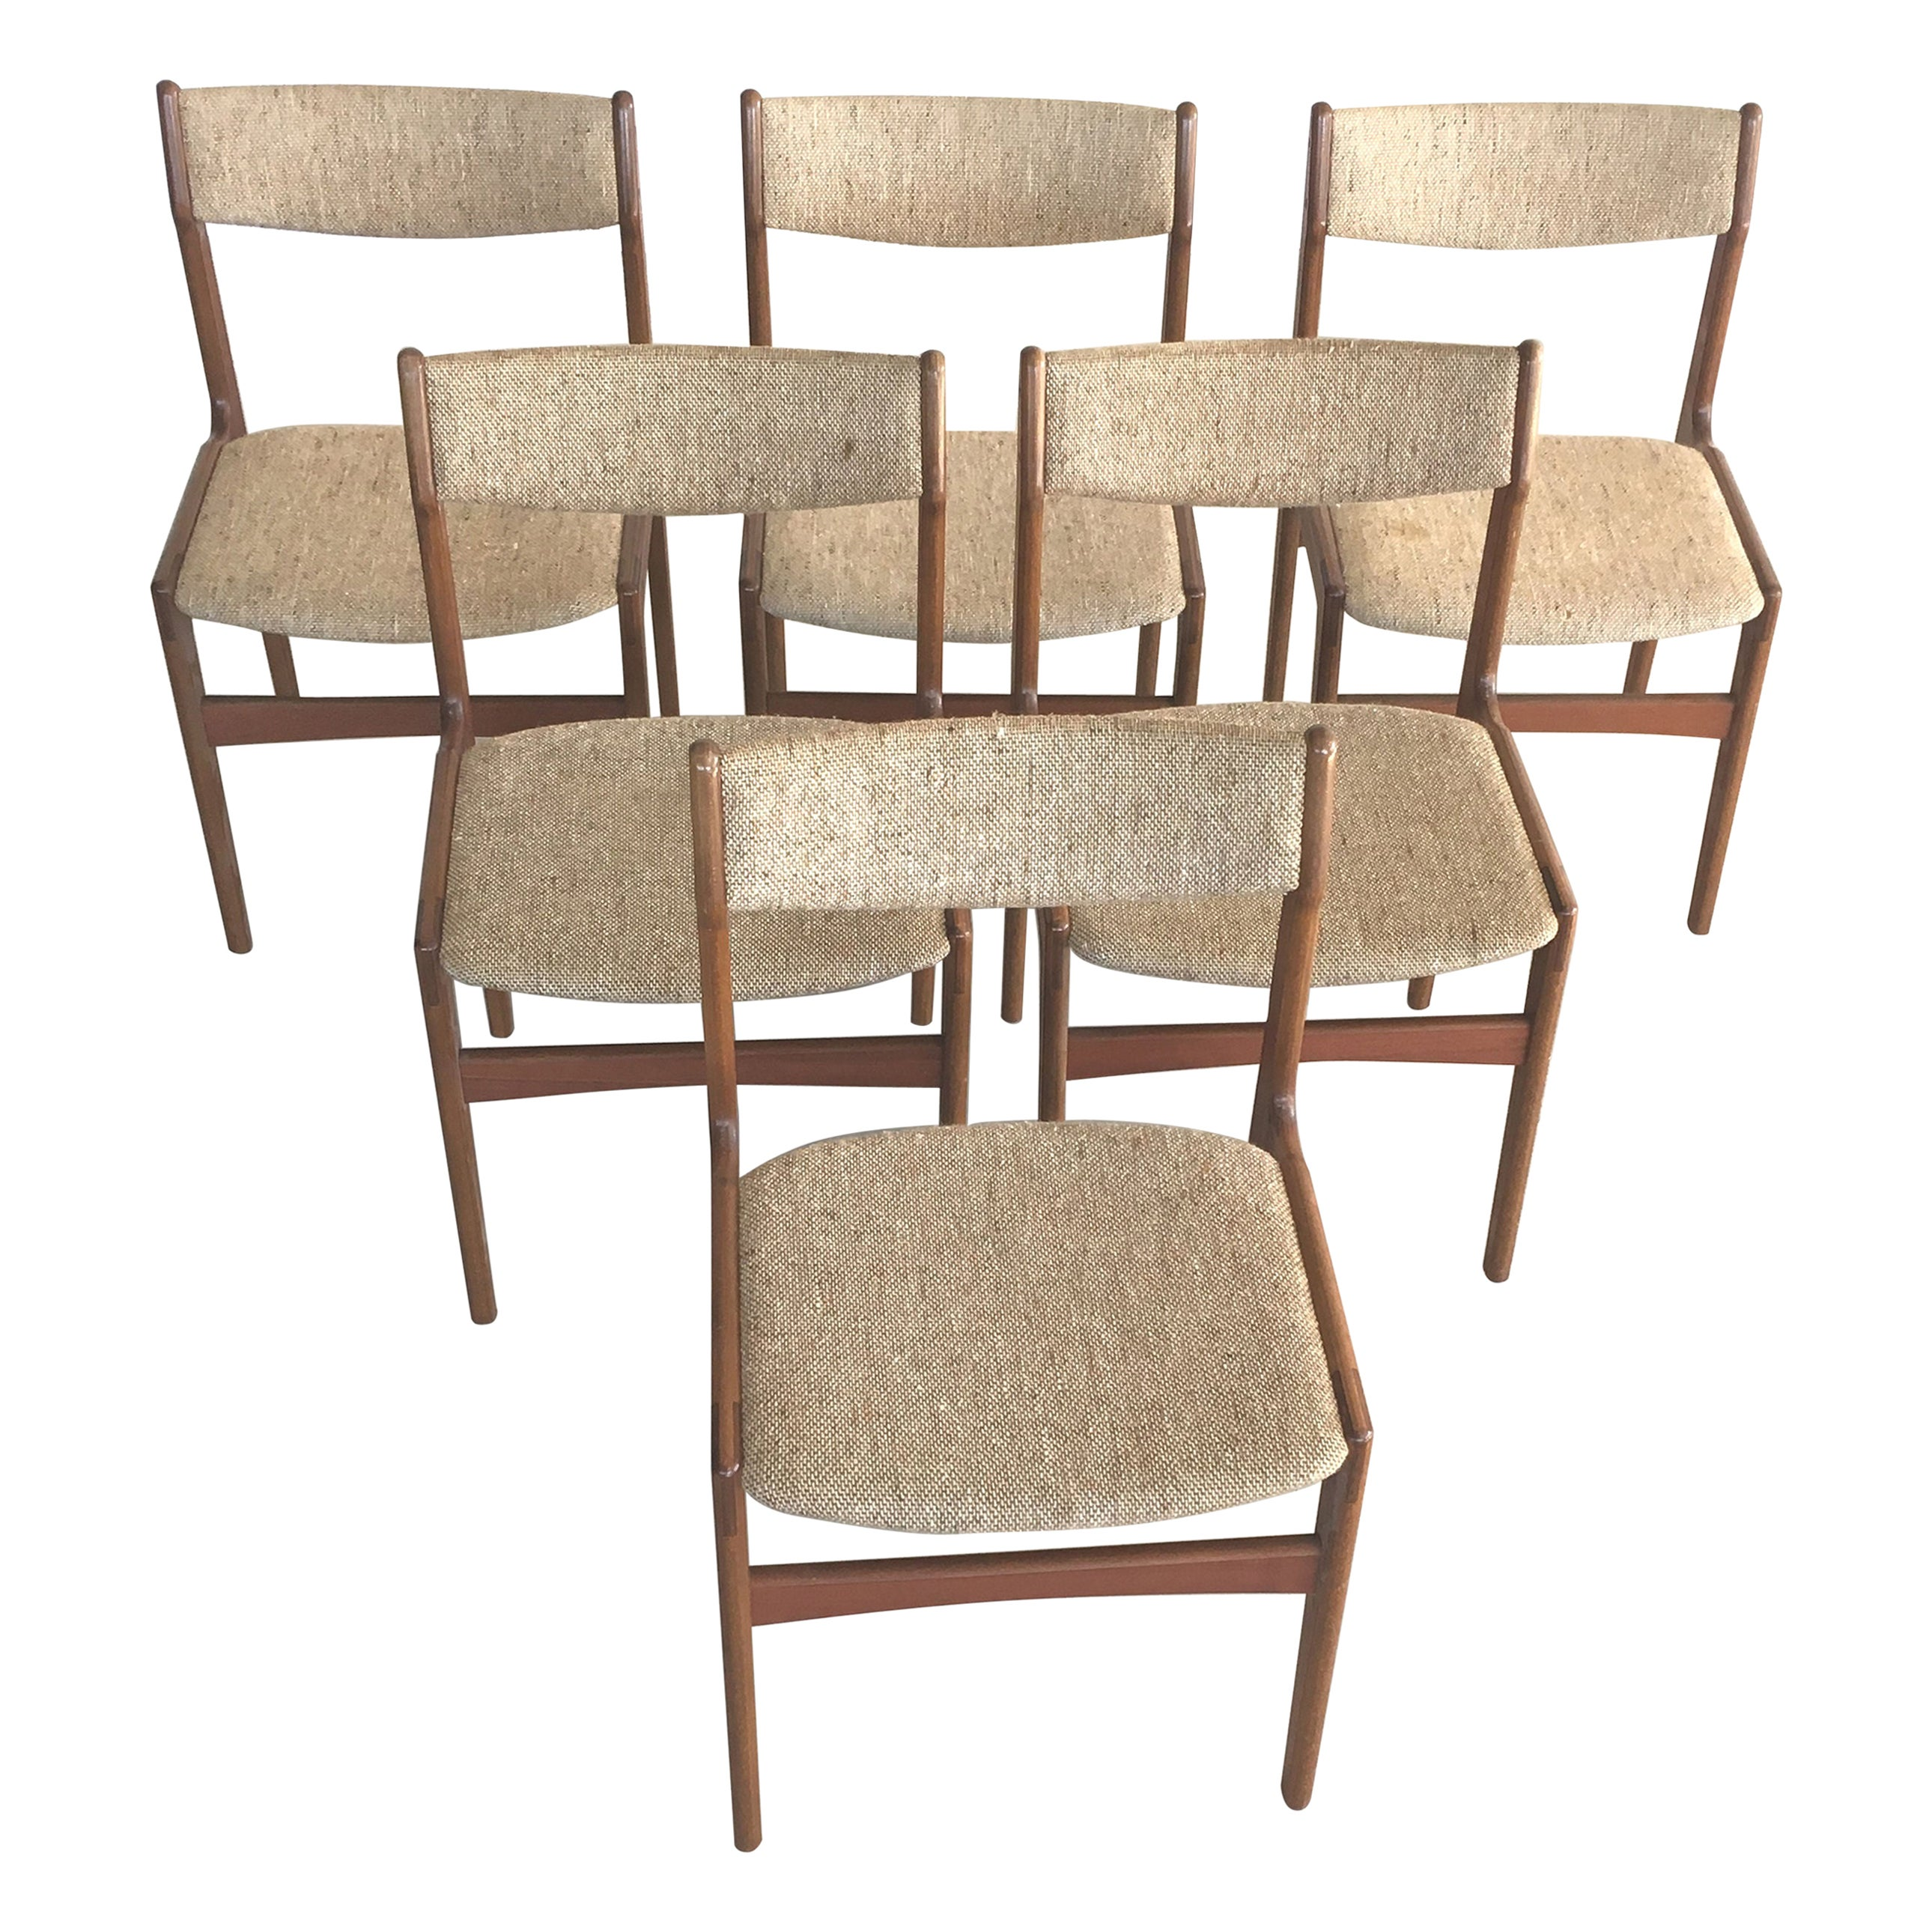 1960s Erik Buch Set of Six Danish Teak Dining Chairs Inc. Reupholstery